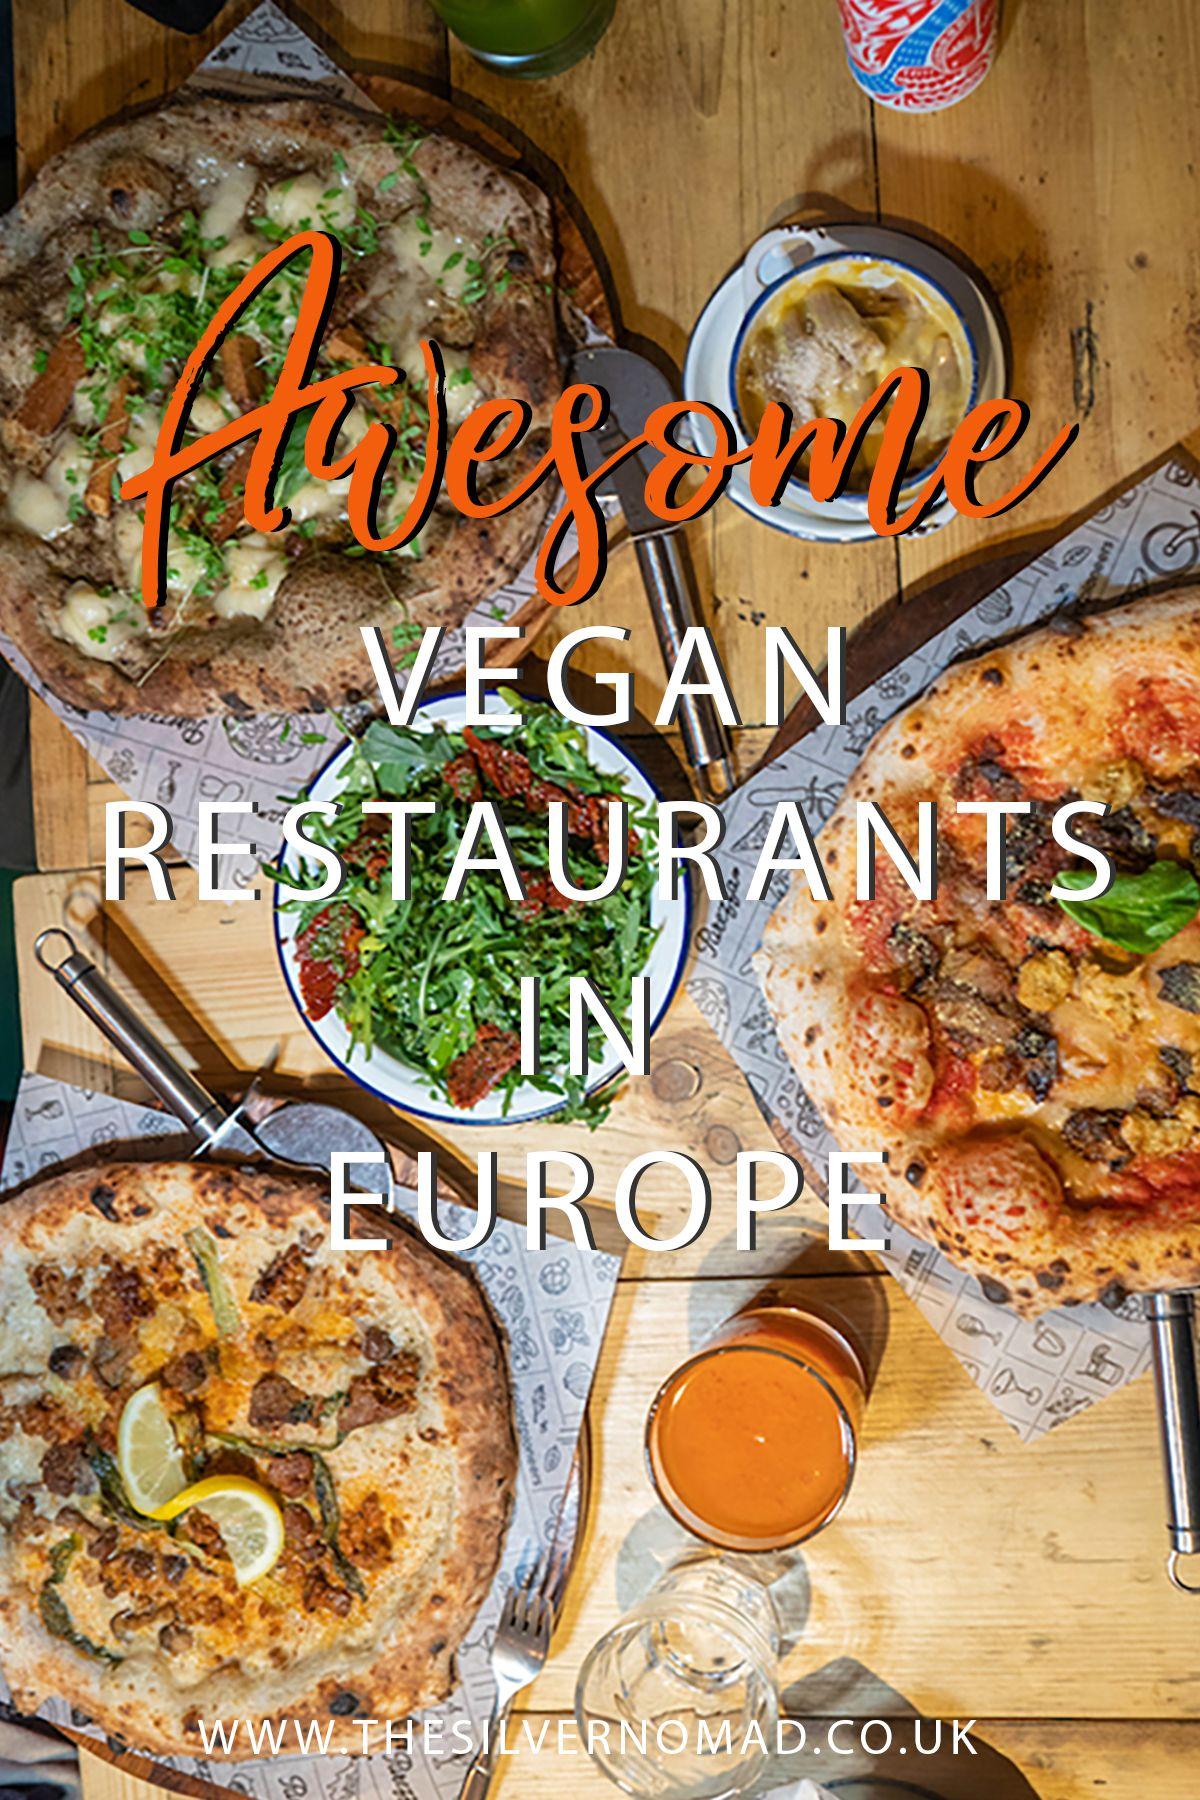 Amazing Vegan Restaurants In Europe The Silver Nomad In 2020 Vegan Restaurants Vegan Junk Food Foodie